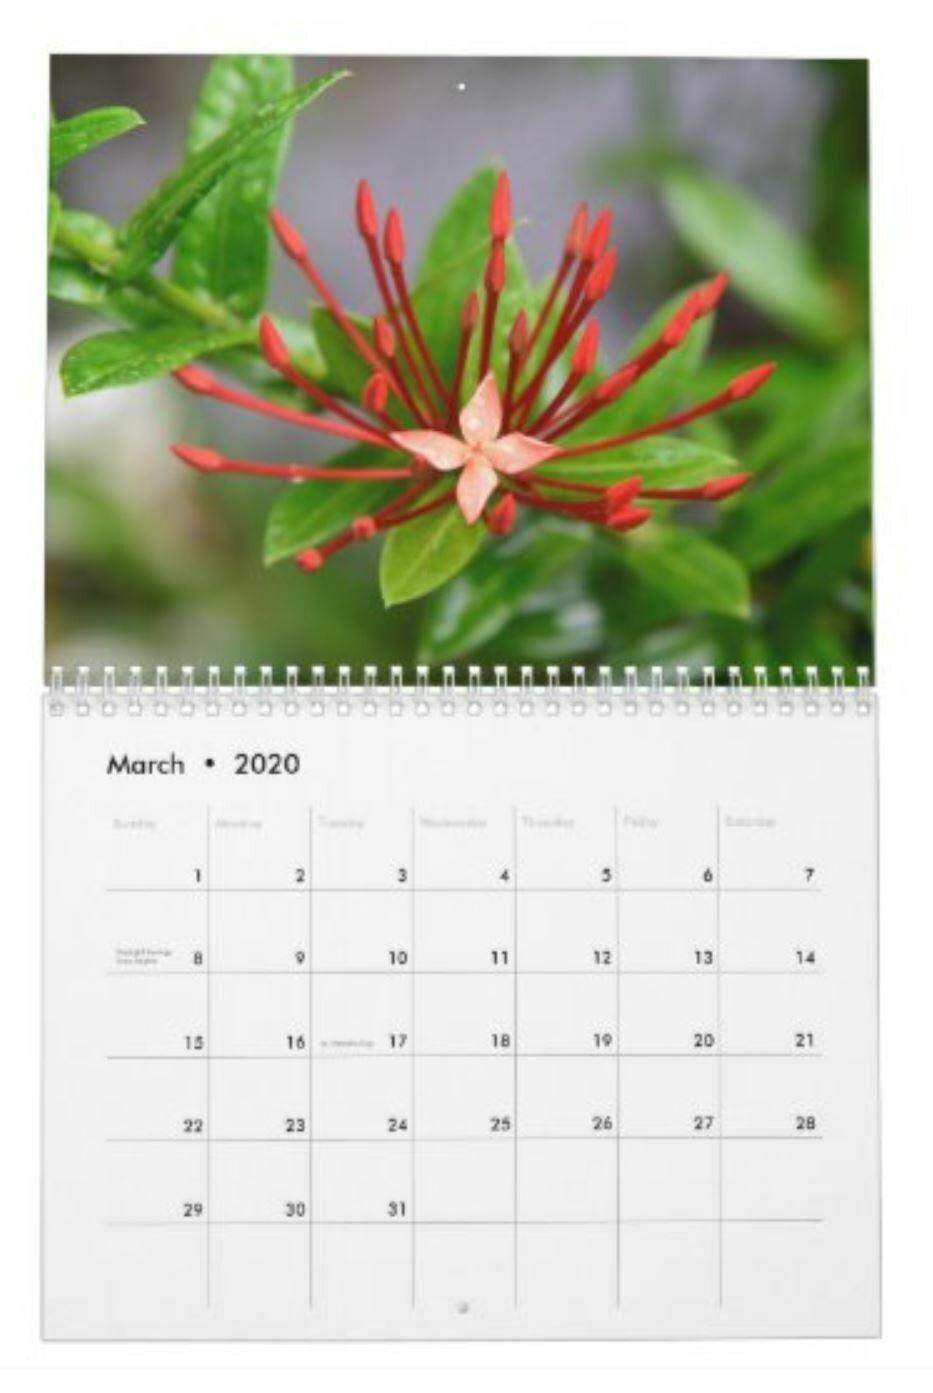 2020 Tropical Photo Calendar